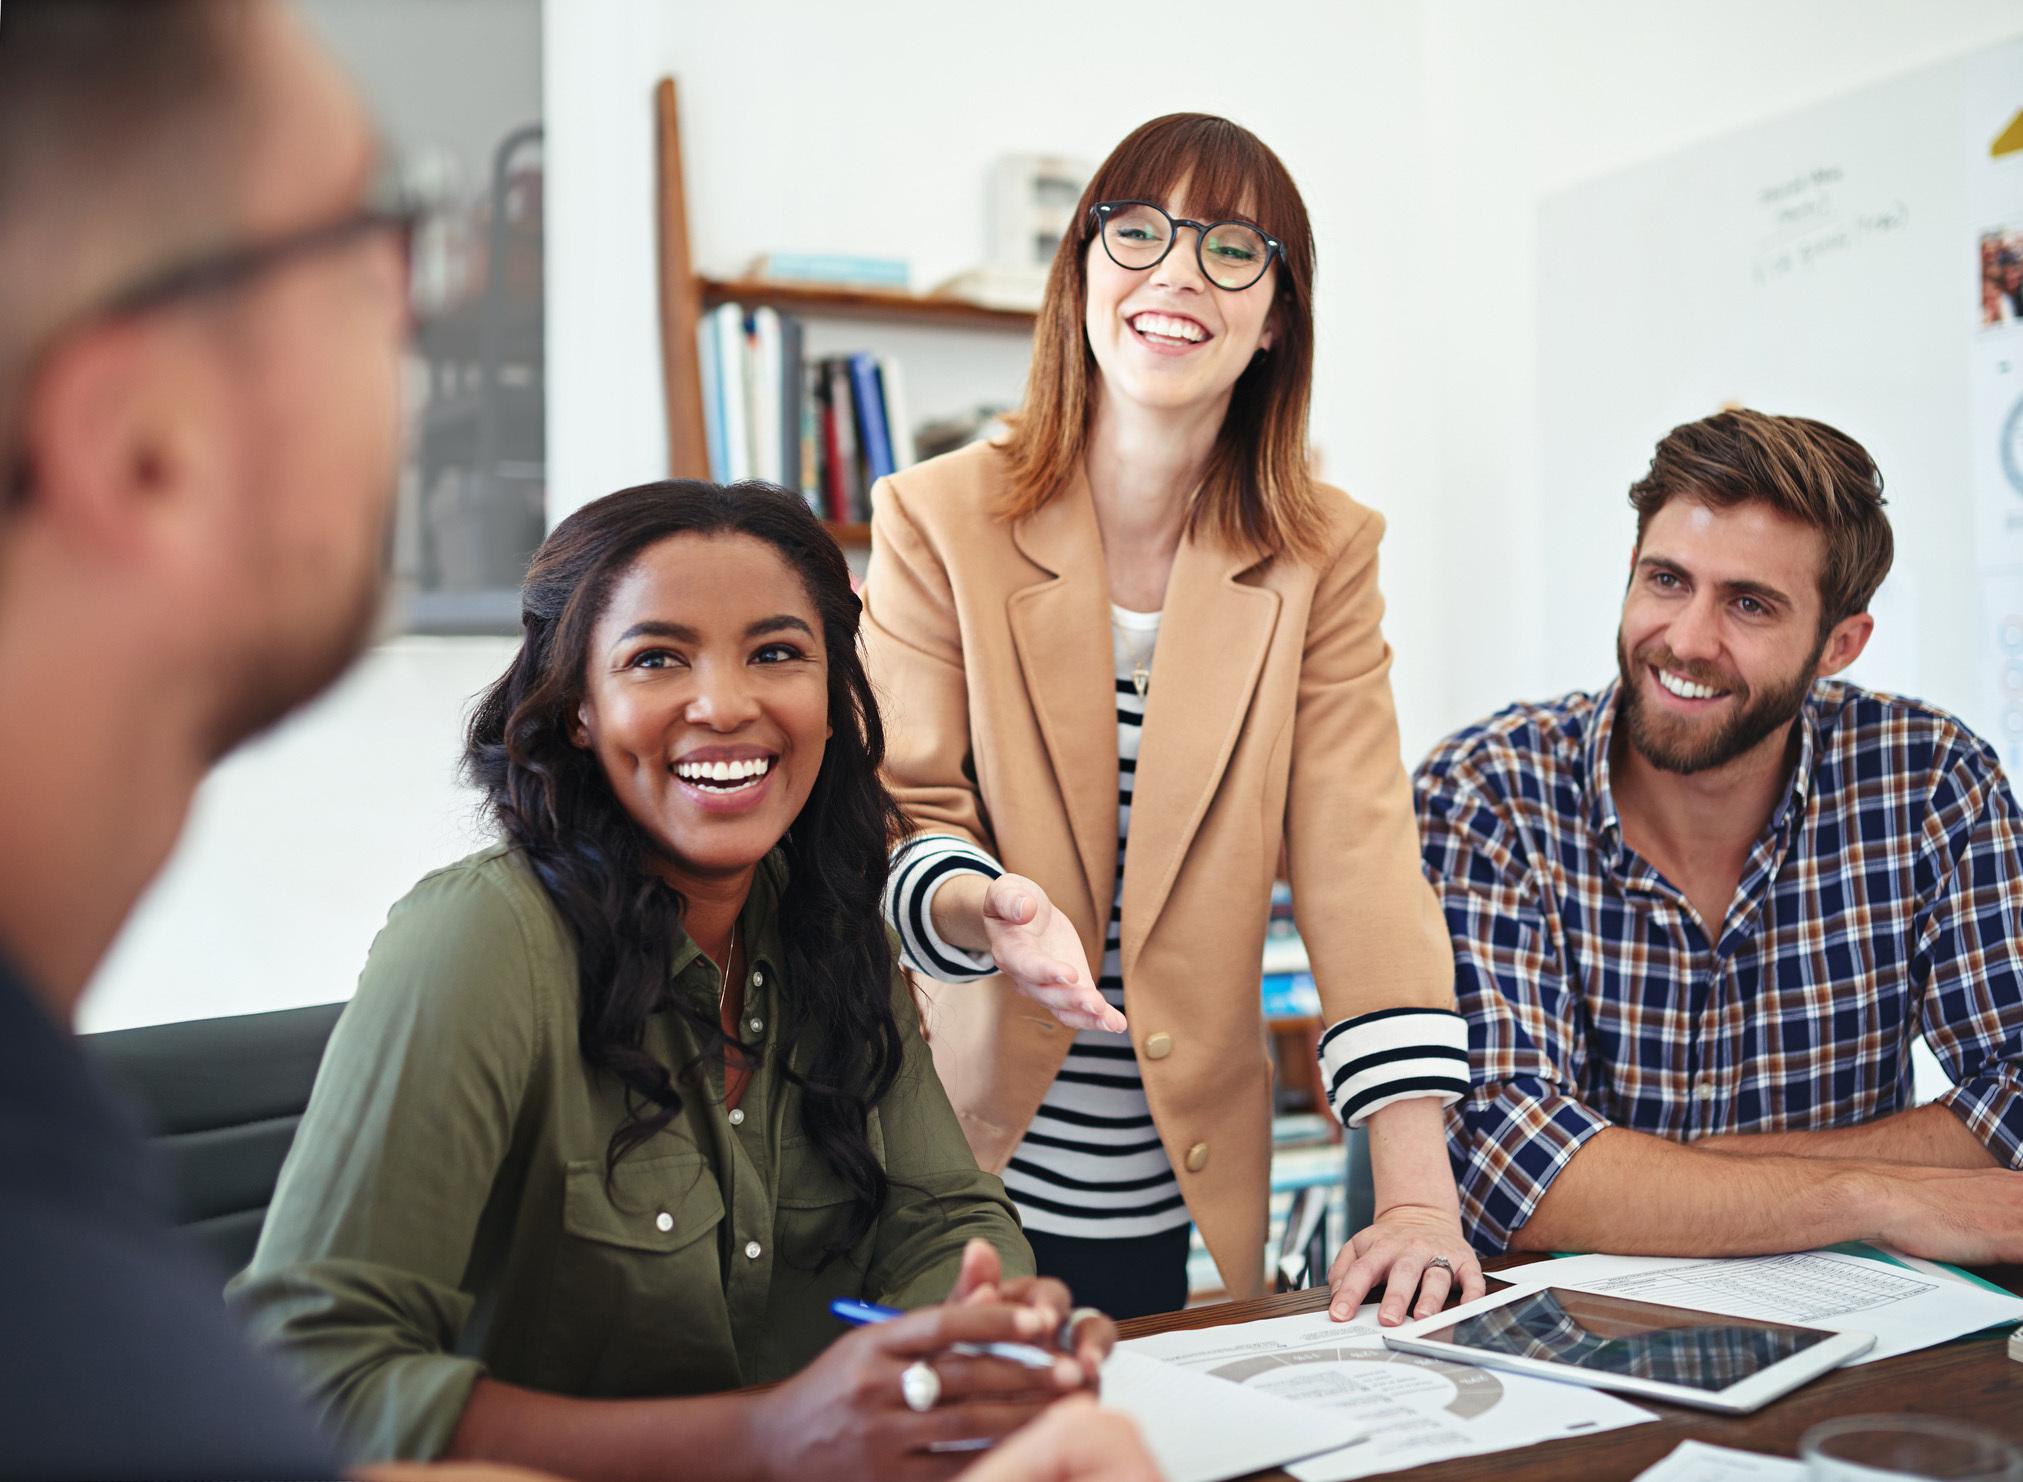 Coworkers in an office talking</figure></div></body></html>